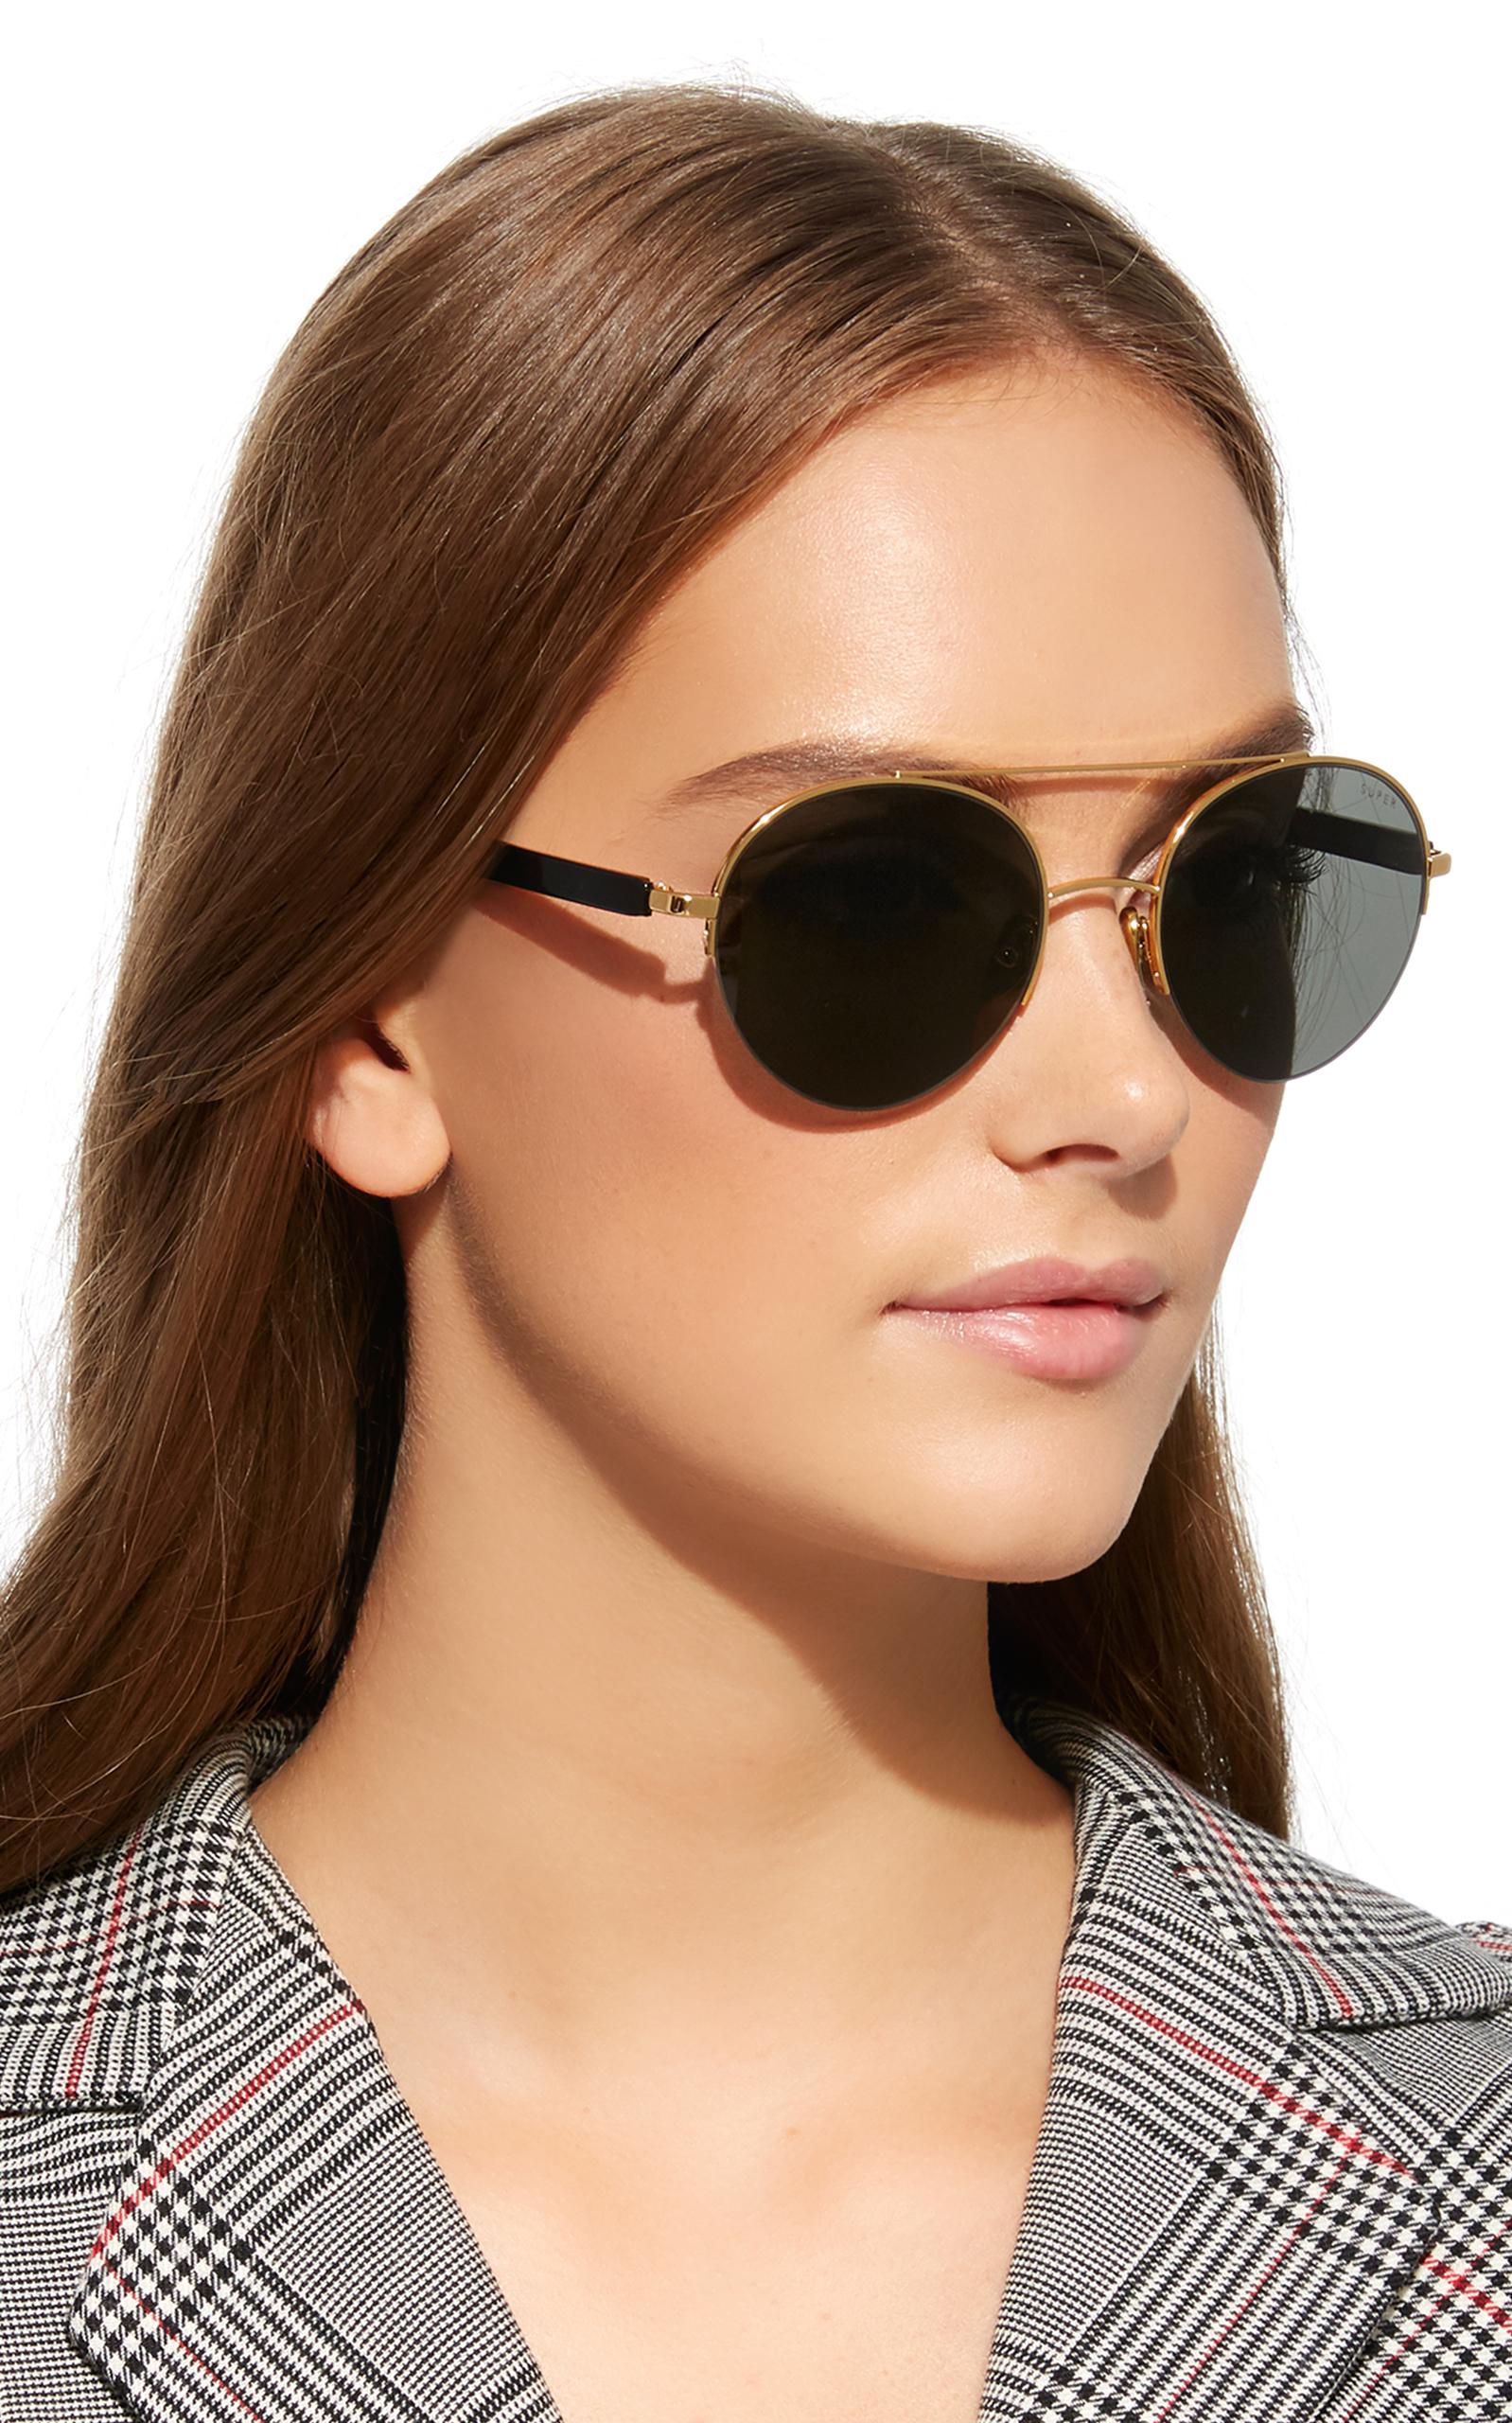 Retrosuperfuture Cooper sunglasses Excellent Sale Online Discount High Quality Buy Cheap Largest Supplier Ne0bRlgB